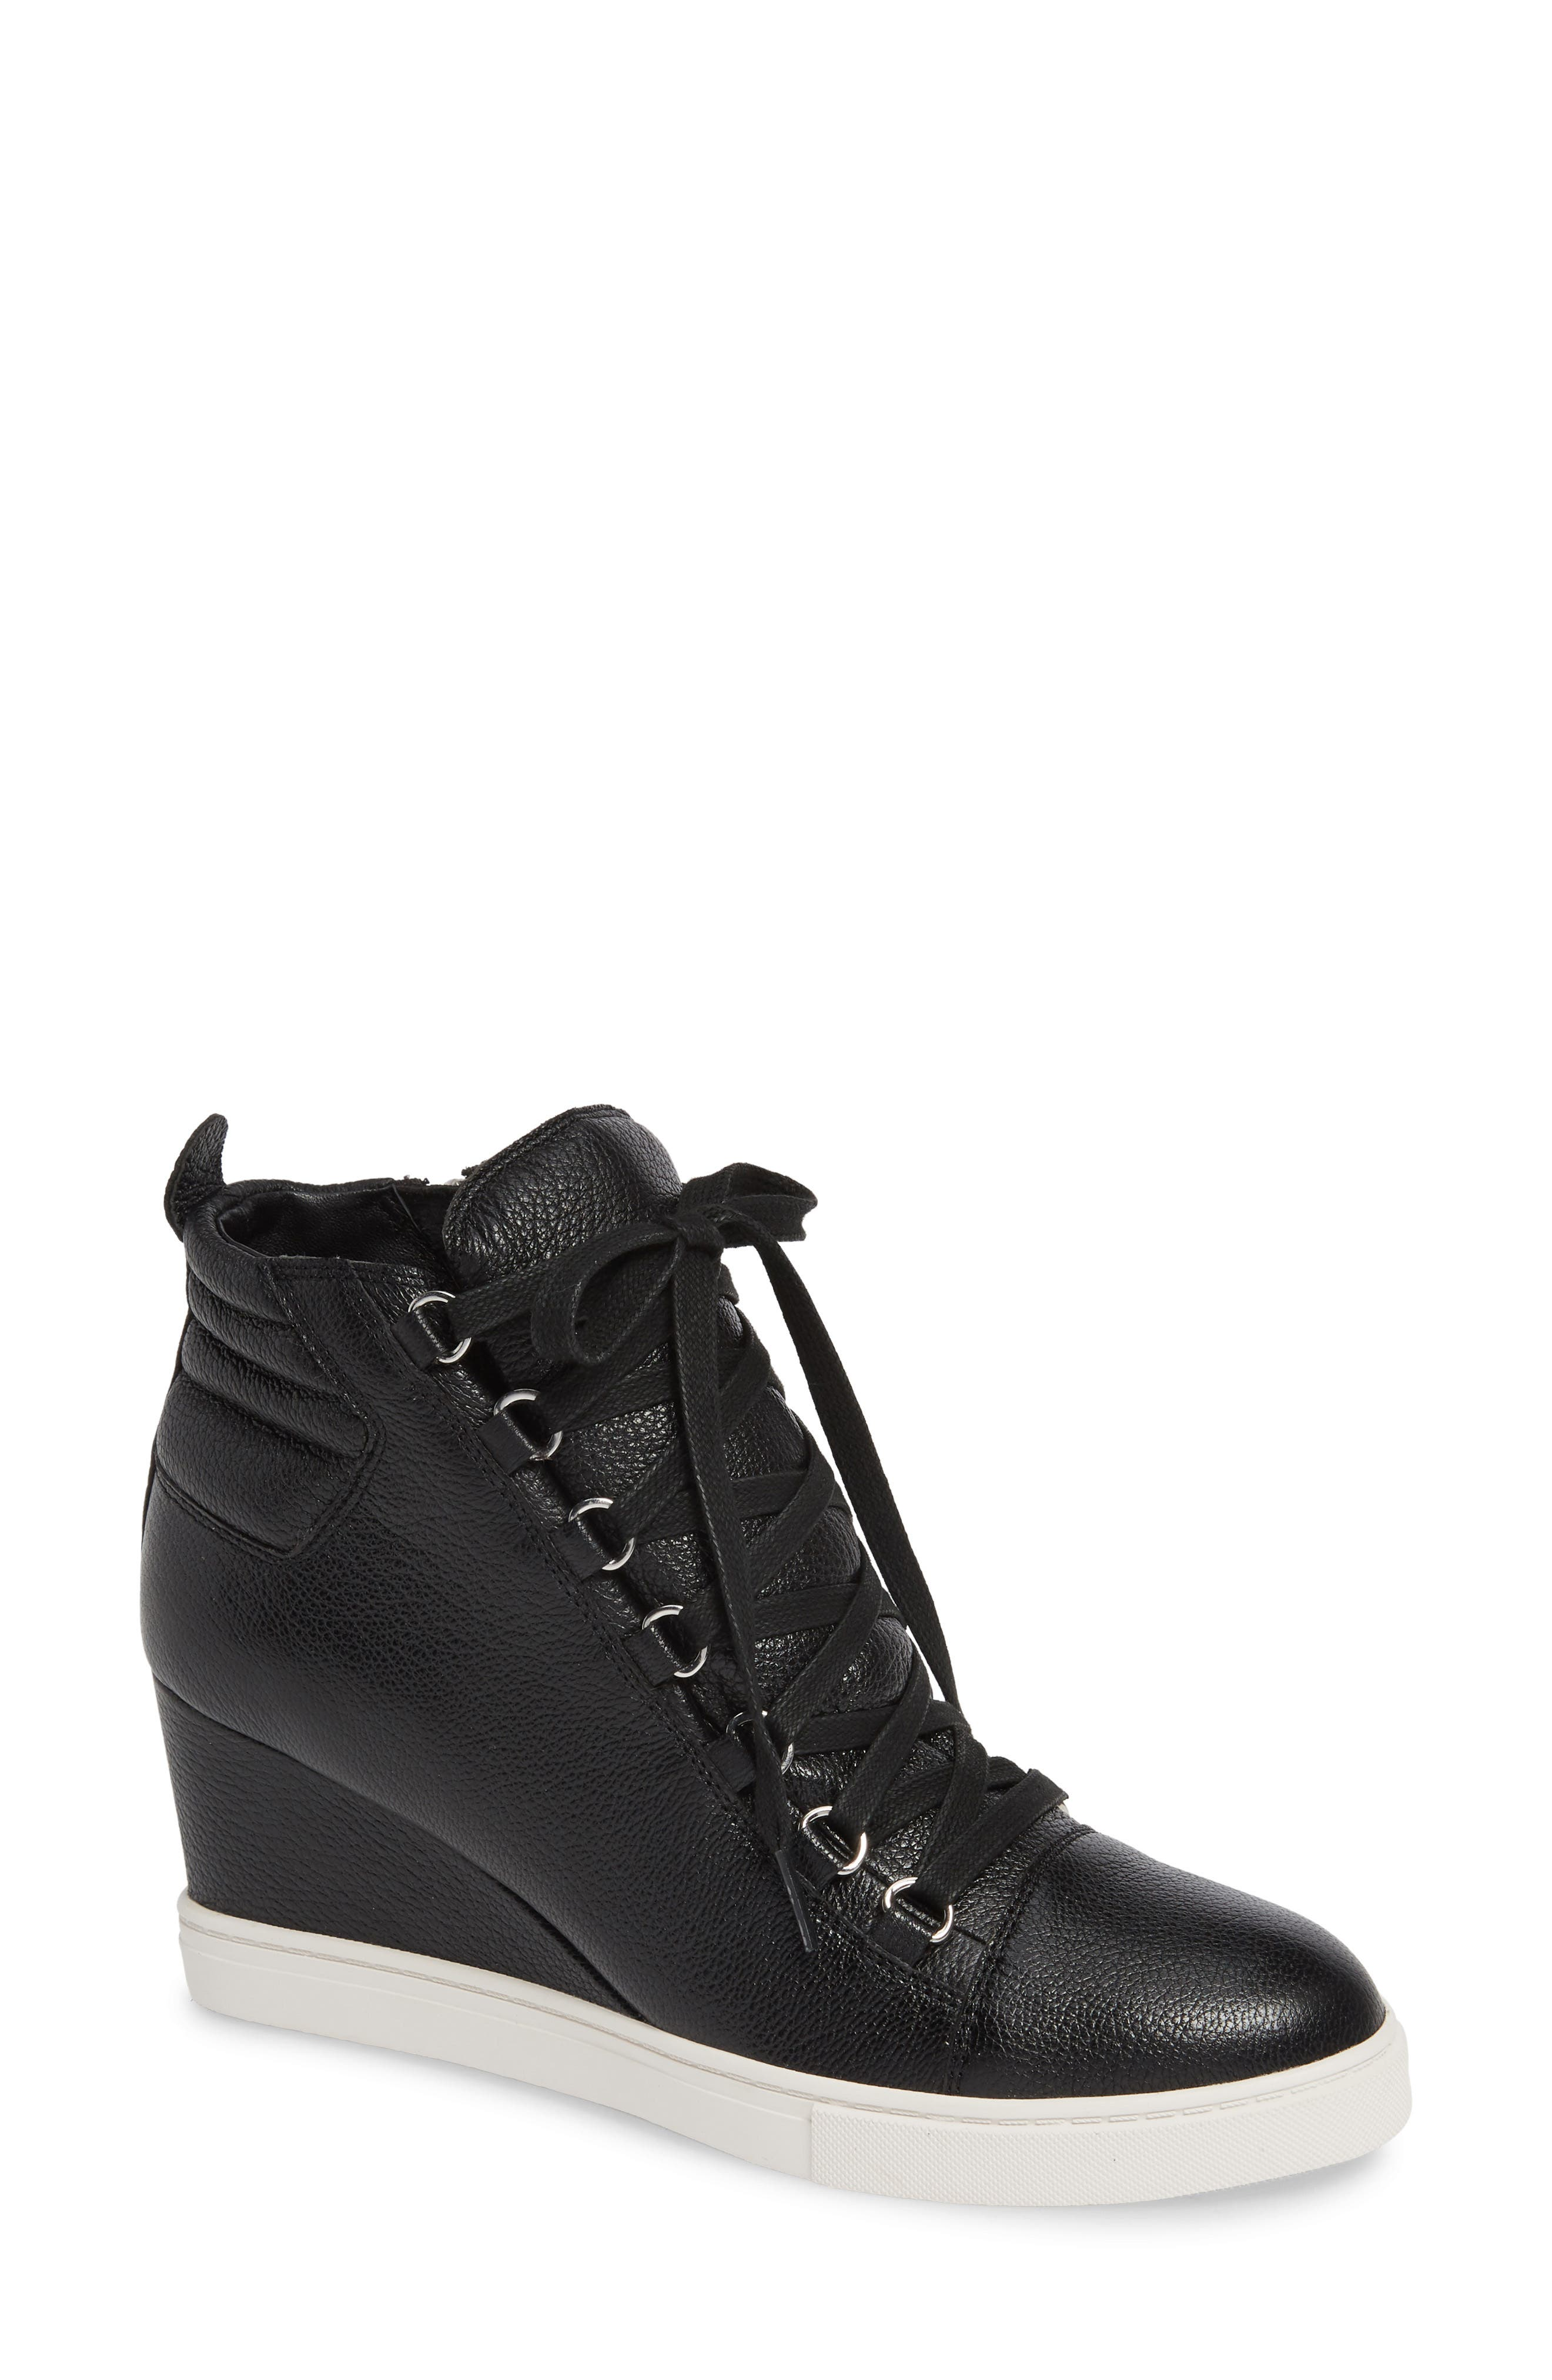 LINEA PAOLO, Fenton Wedge Sneaker, Main thumbnail 1, color, BLACK TUMBLED LEATHER